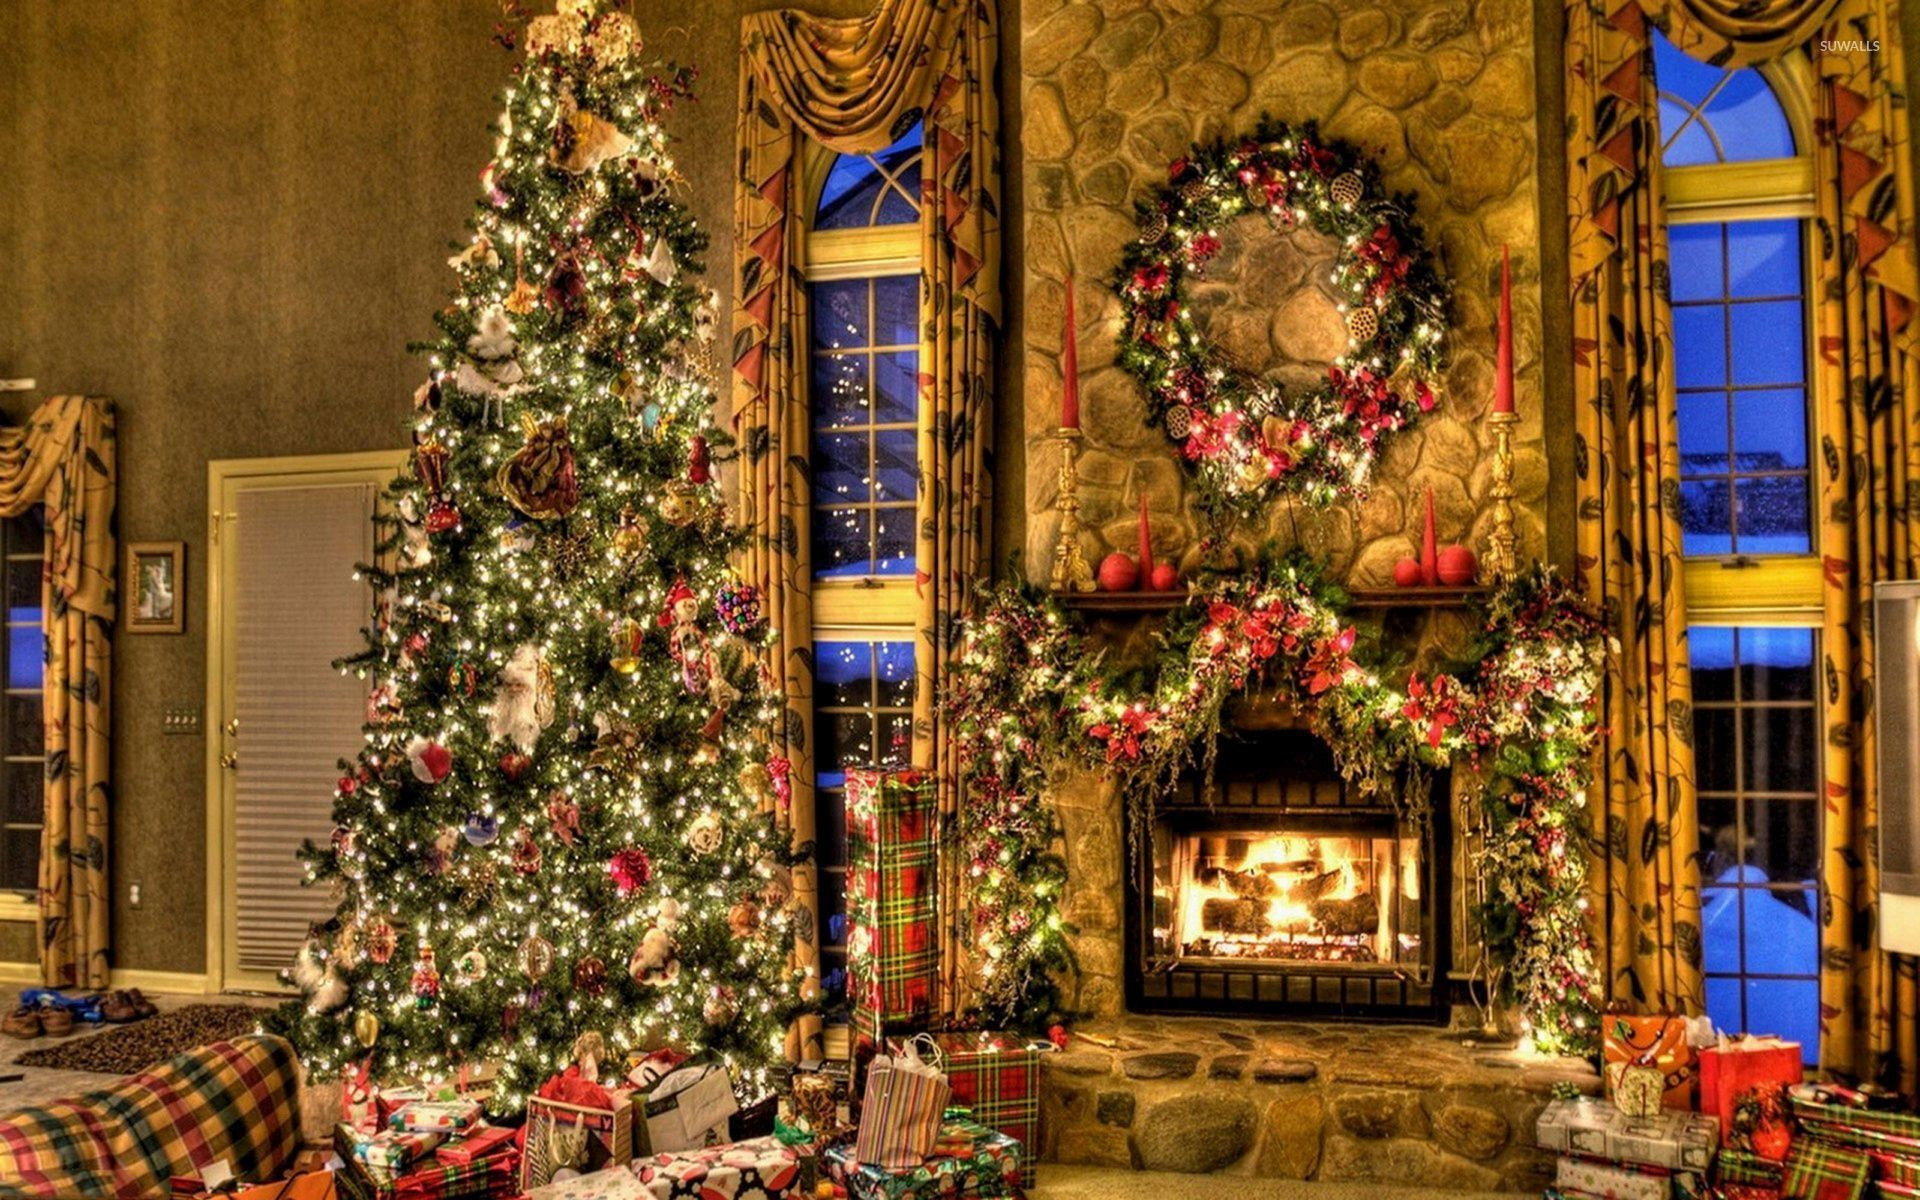 Christmas Tree Fireplace  Christmas Fireplace Wallpaper ·① WallpaperTag